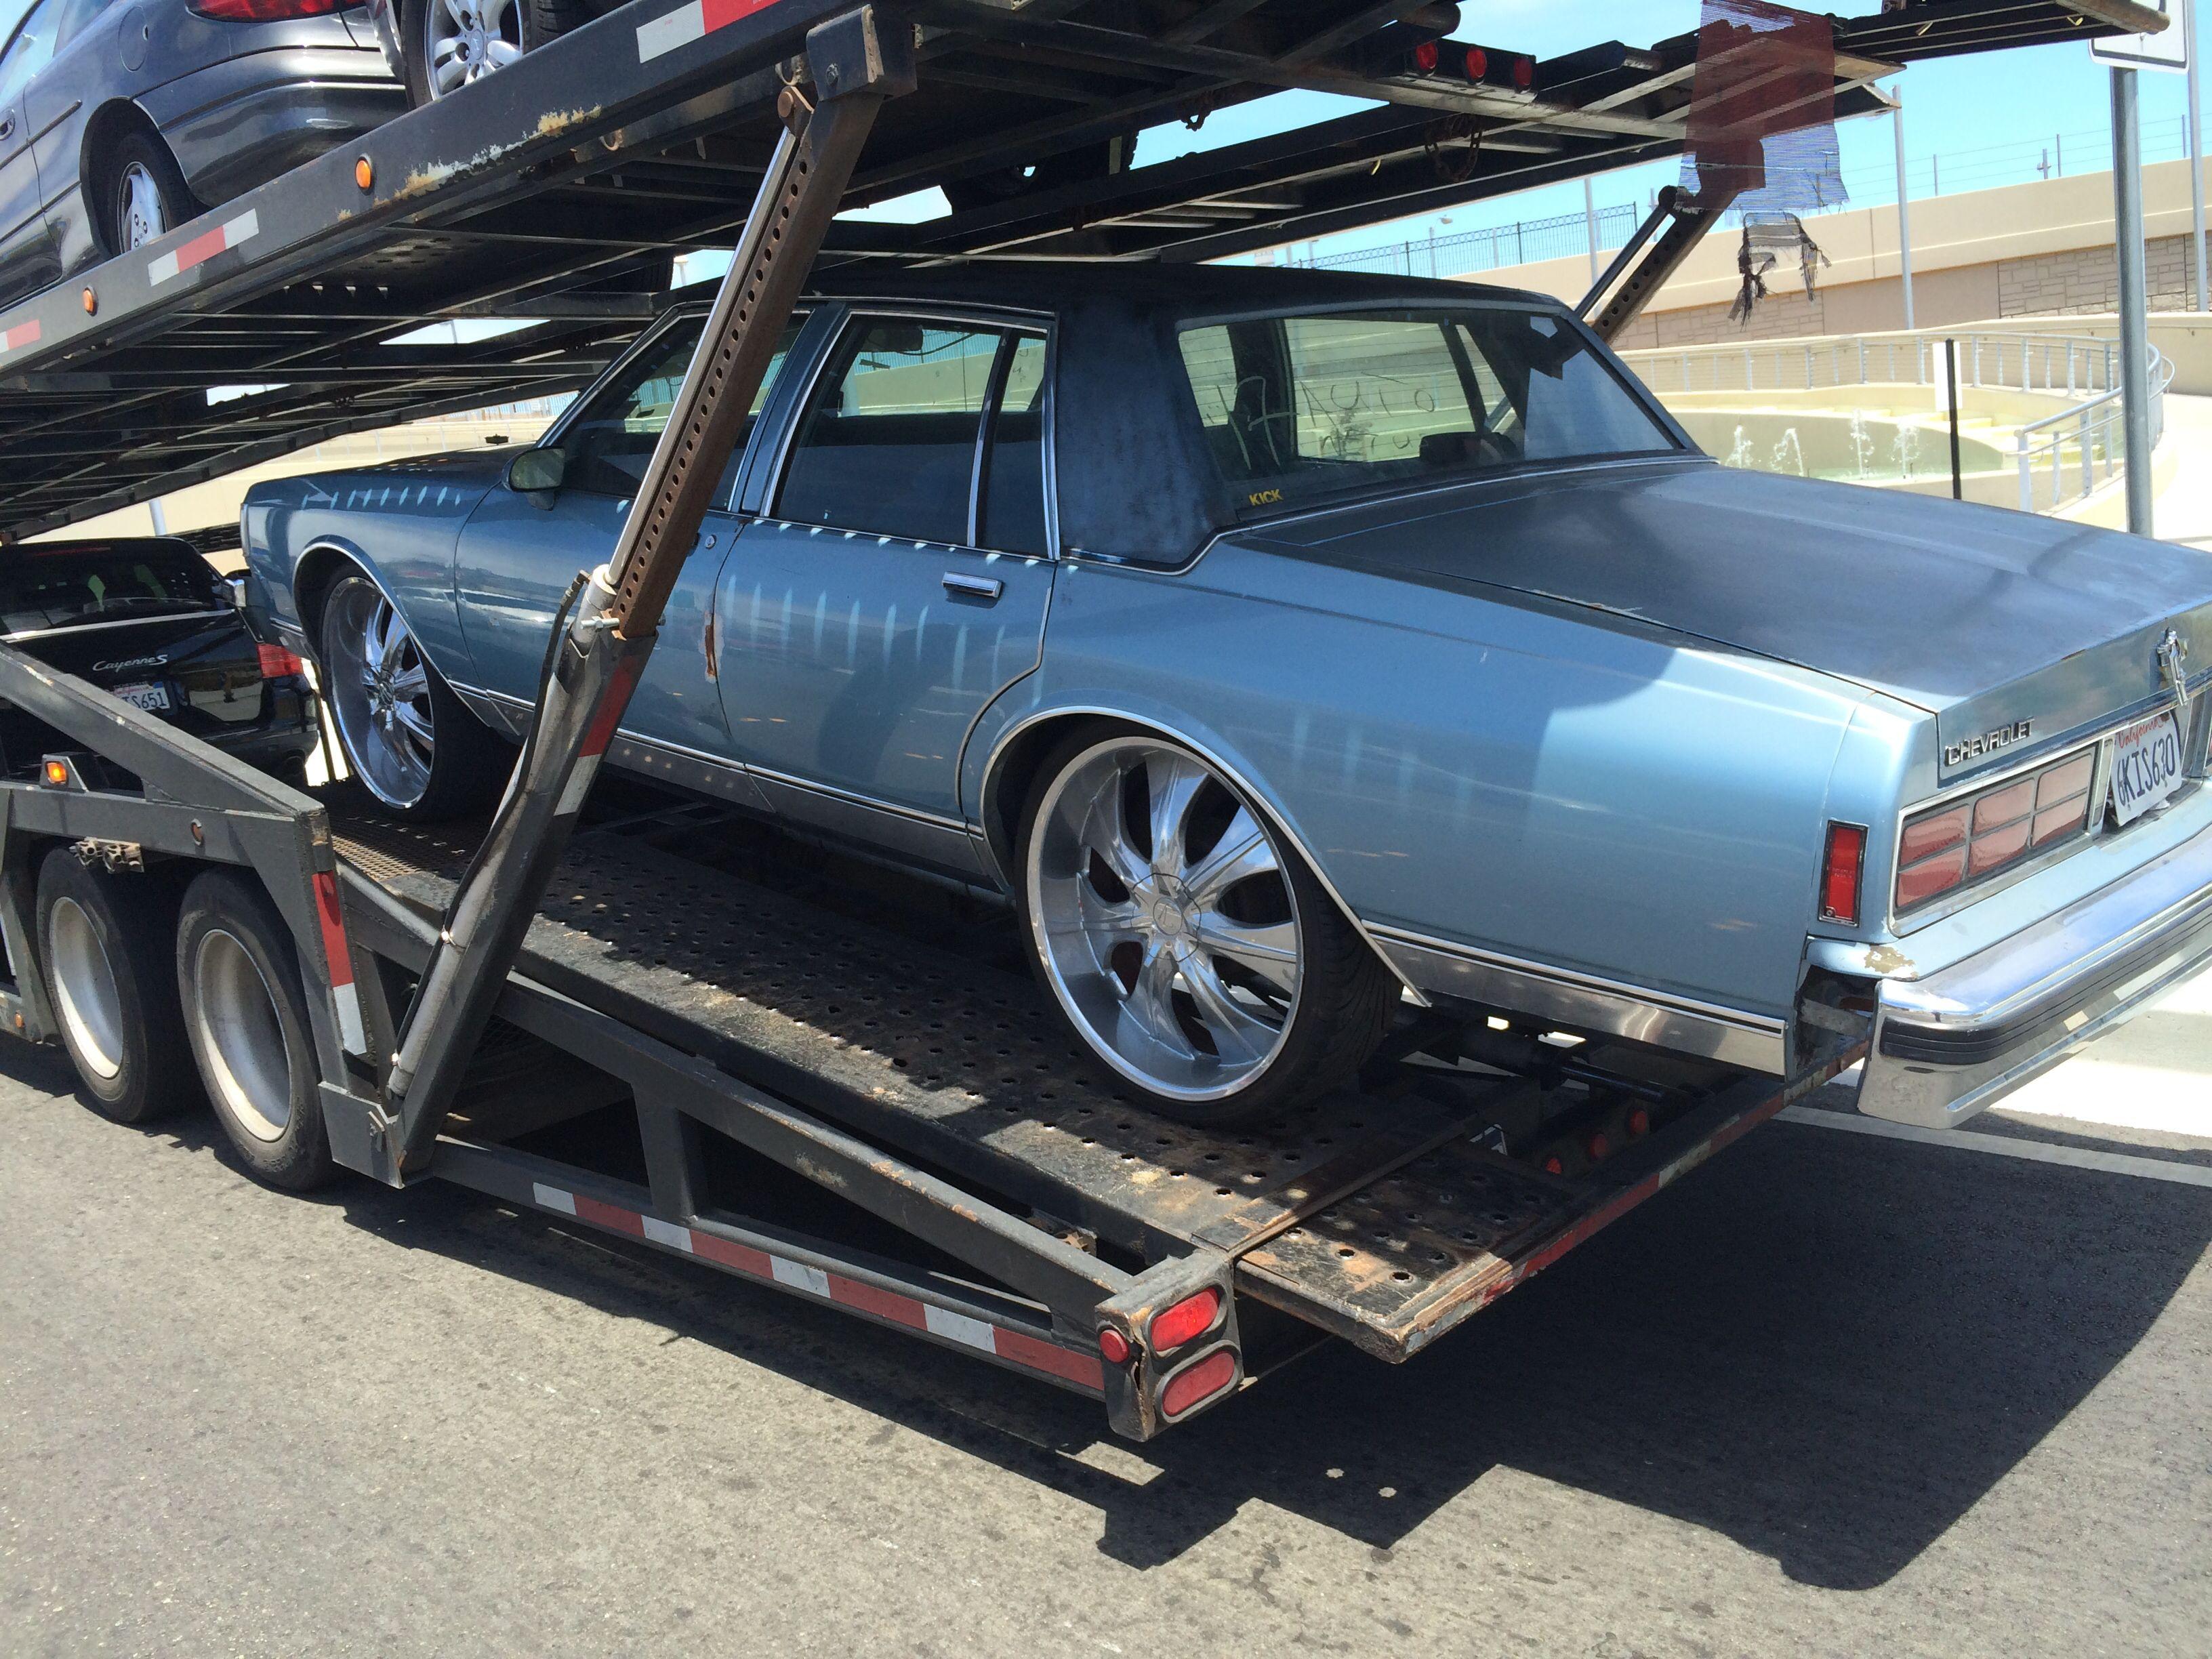 Used Cars Paducah Ky >> 1987 Chevy Caprice Classic 2995 Stevescars Com Paducah